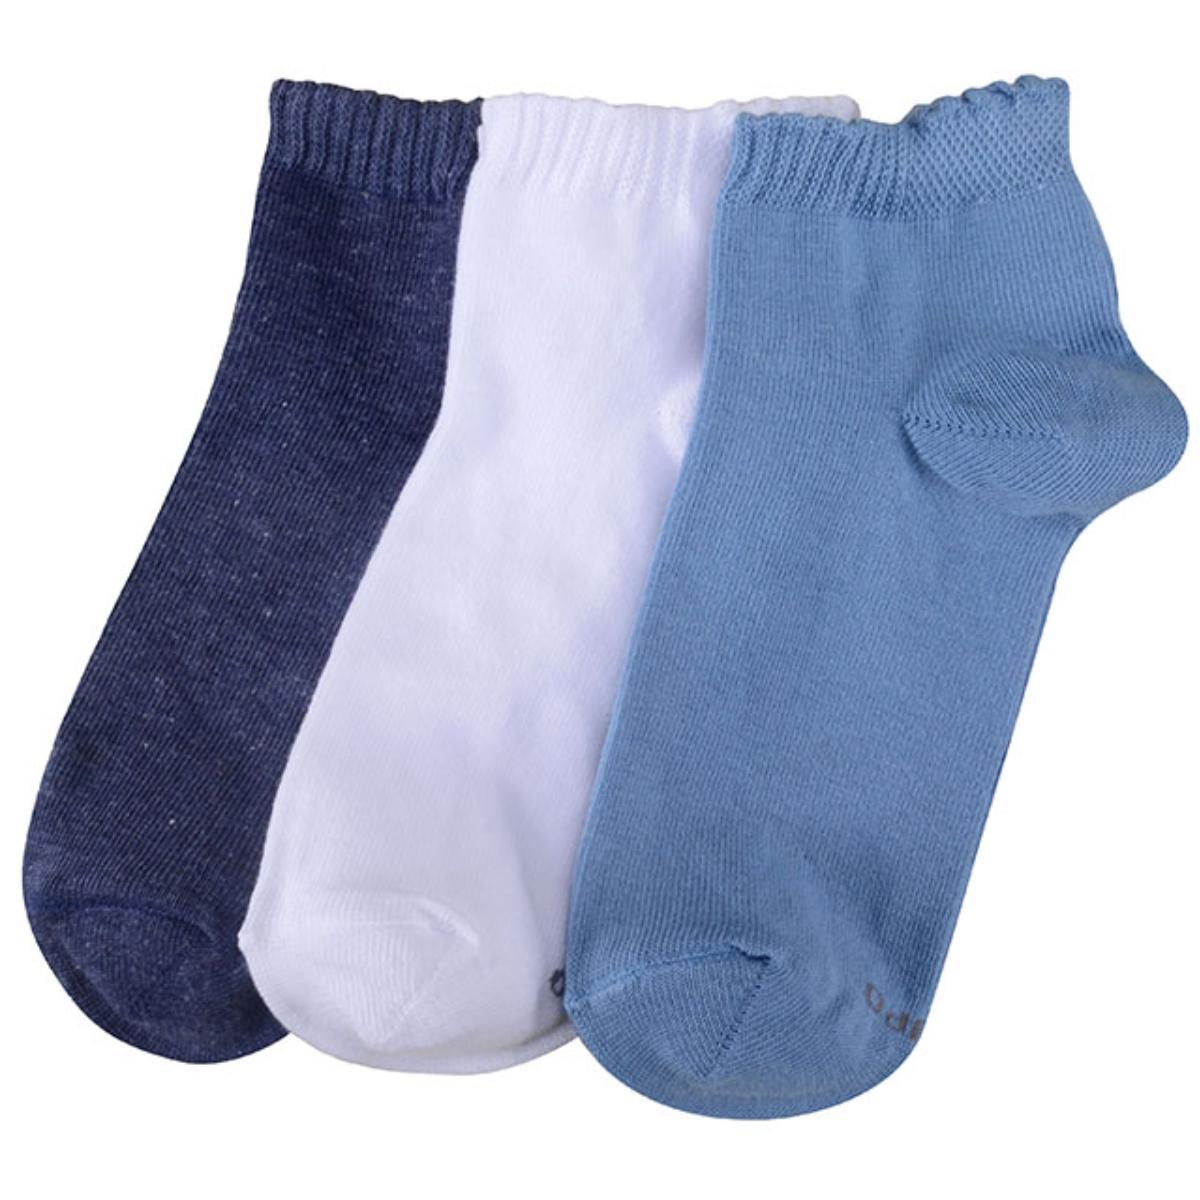 Meia Feminina Lupo 4535 089 0980 Kit C/3 Branco/azul/marinho